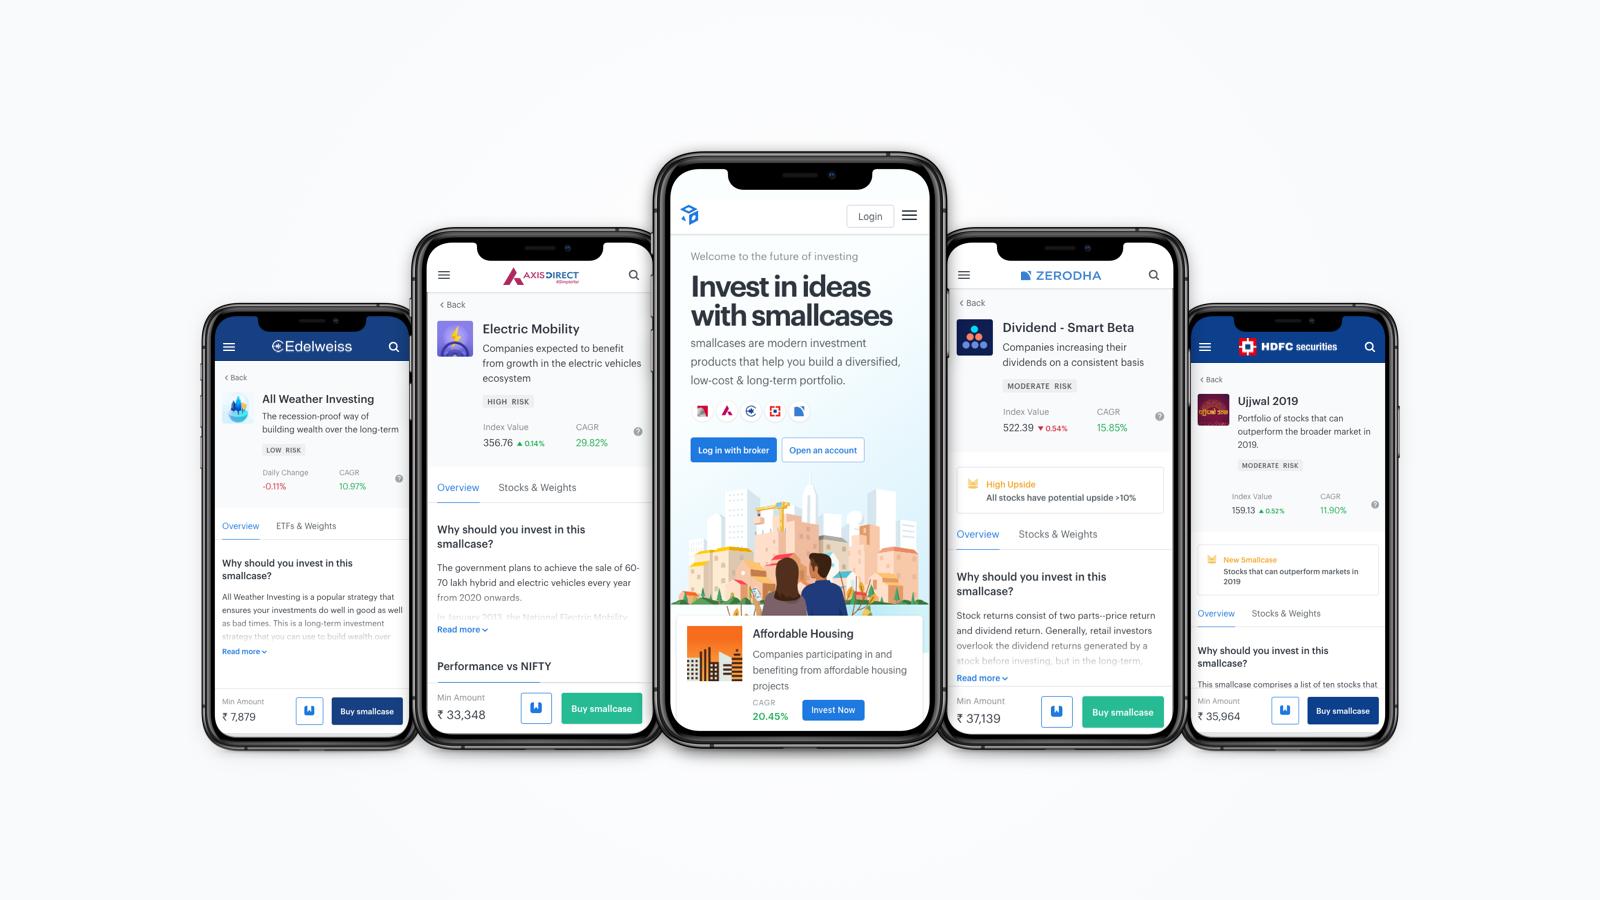 Fintech startup Smallcase